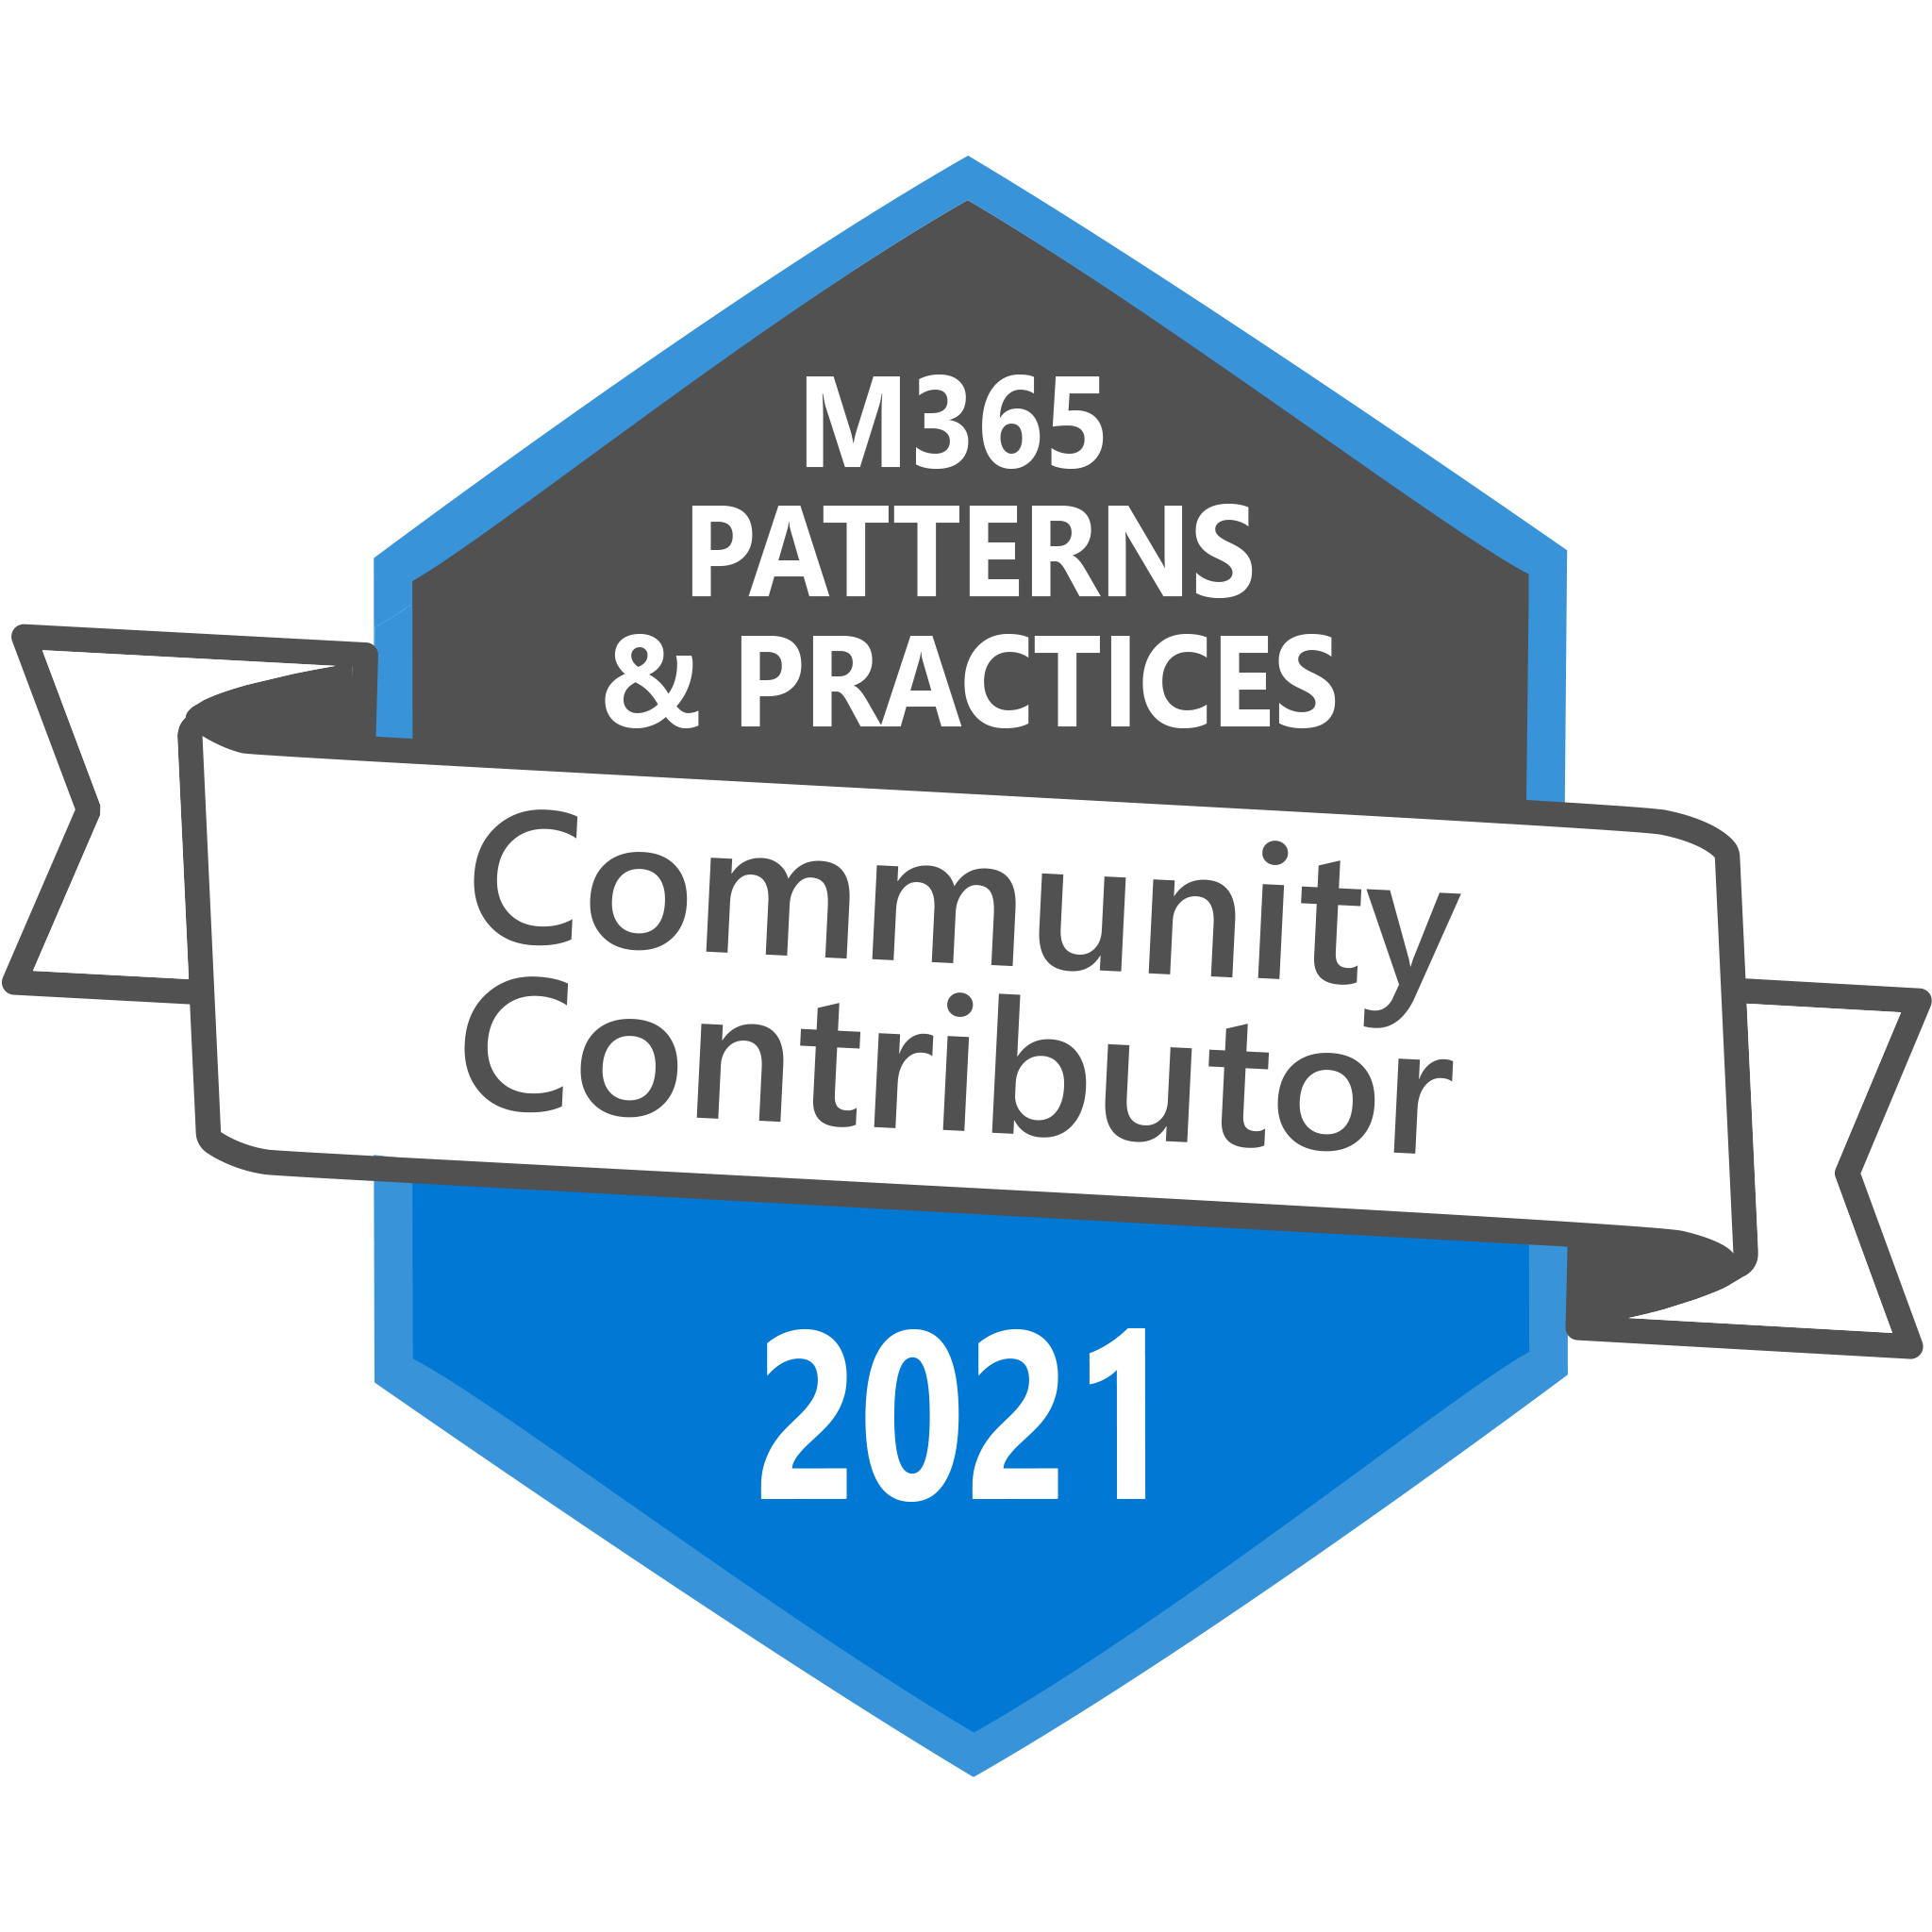 Community Contributor 2021